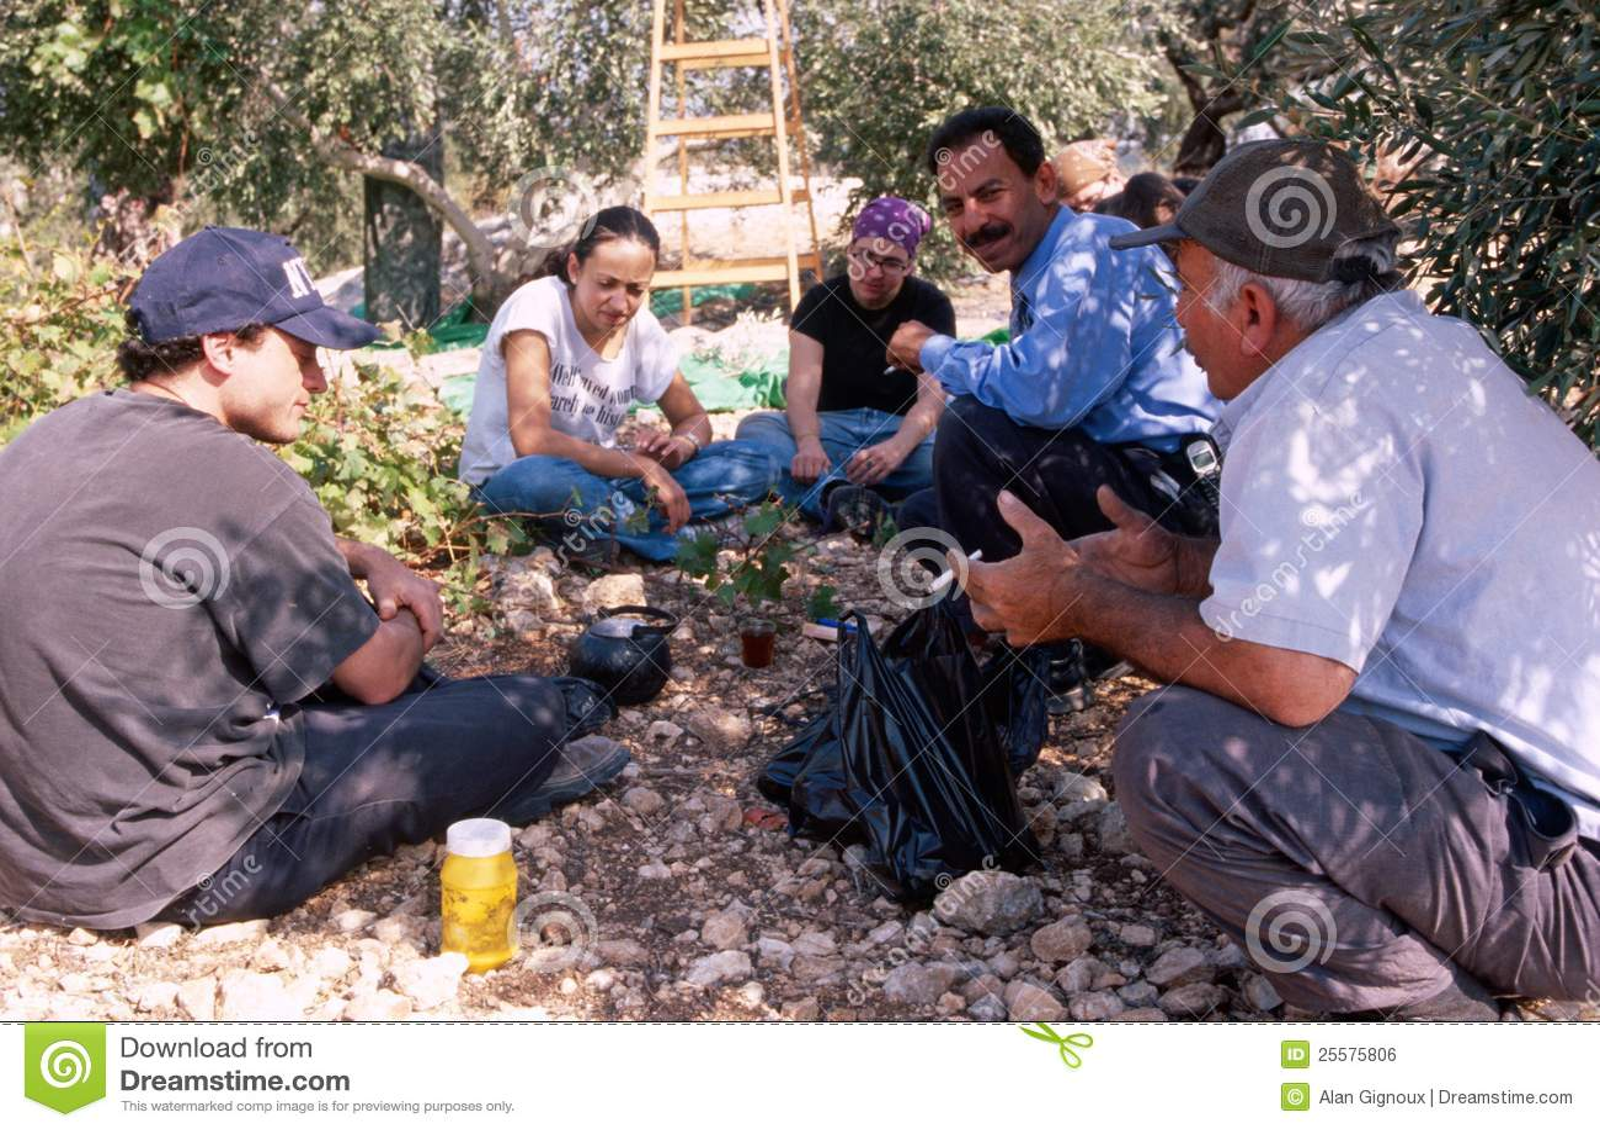 ISM volunteers taking a break in an olive grove.